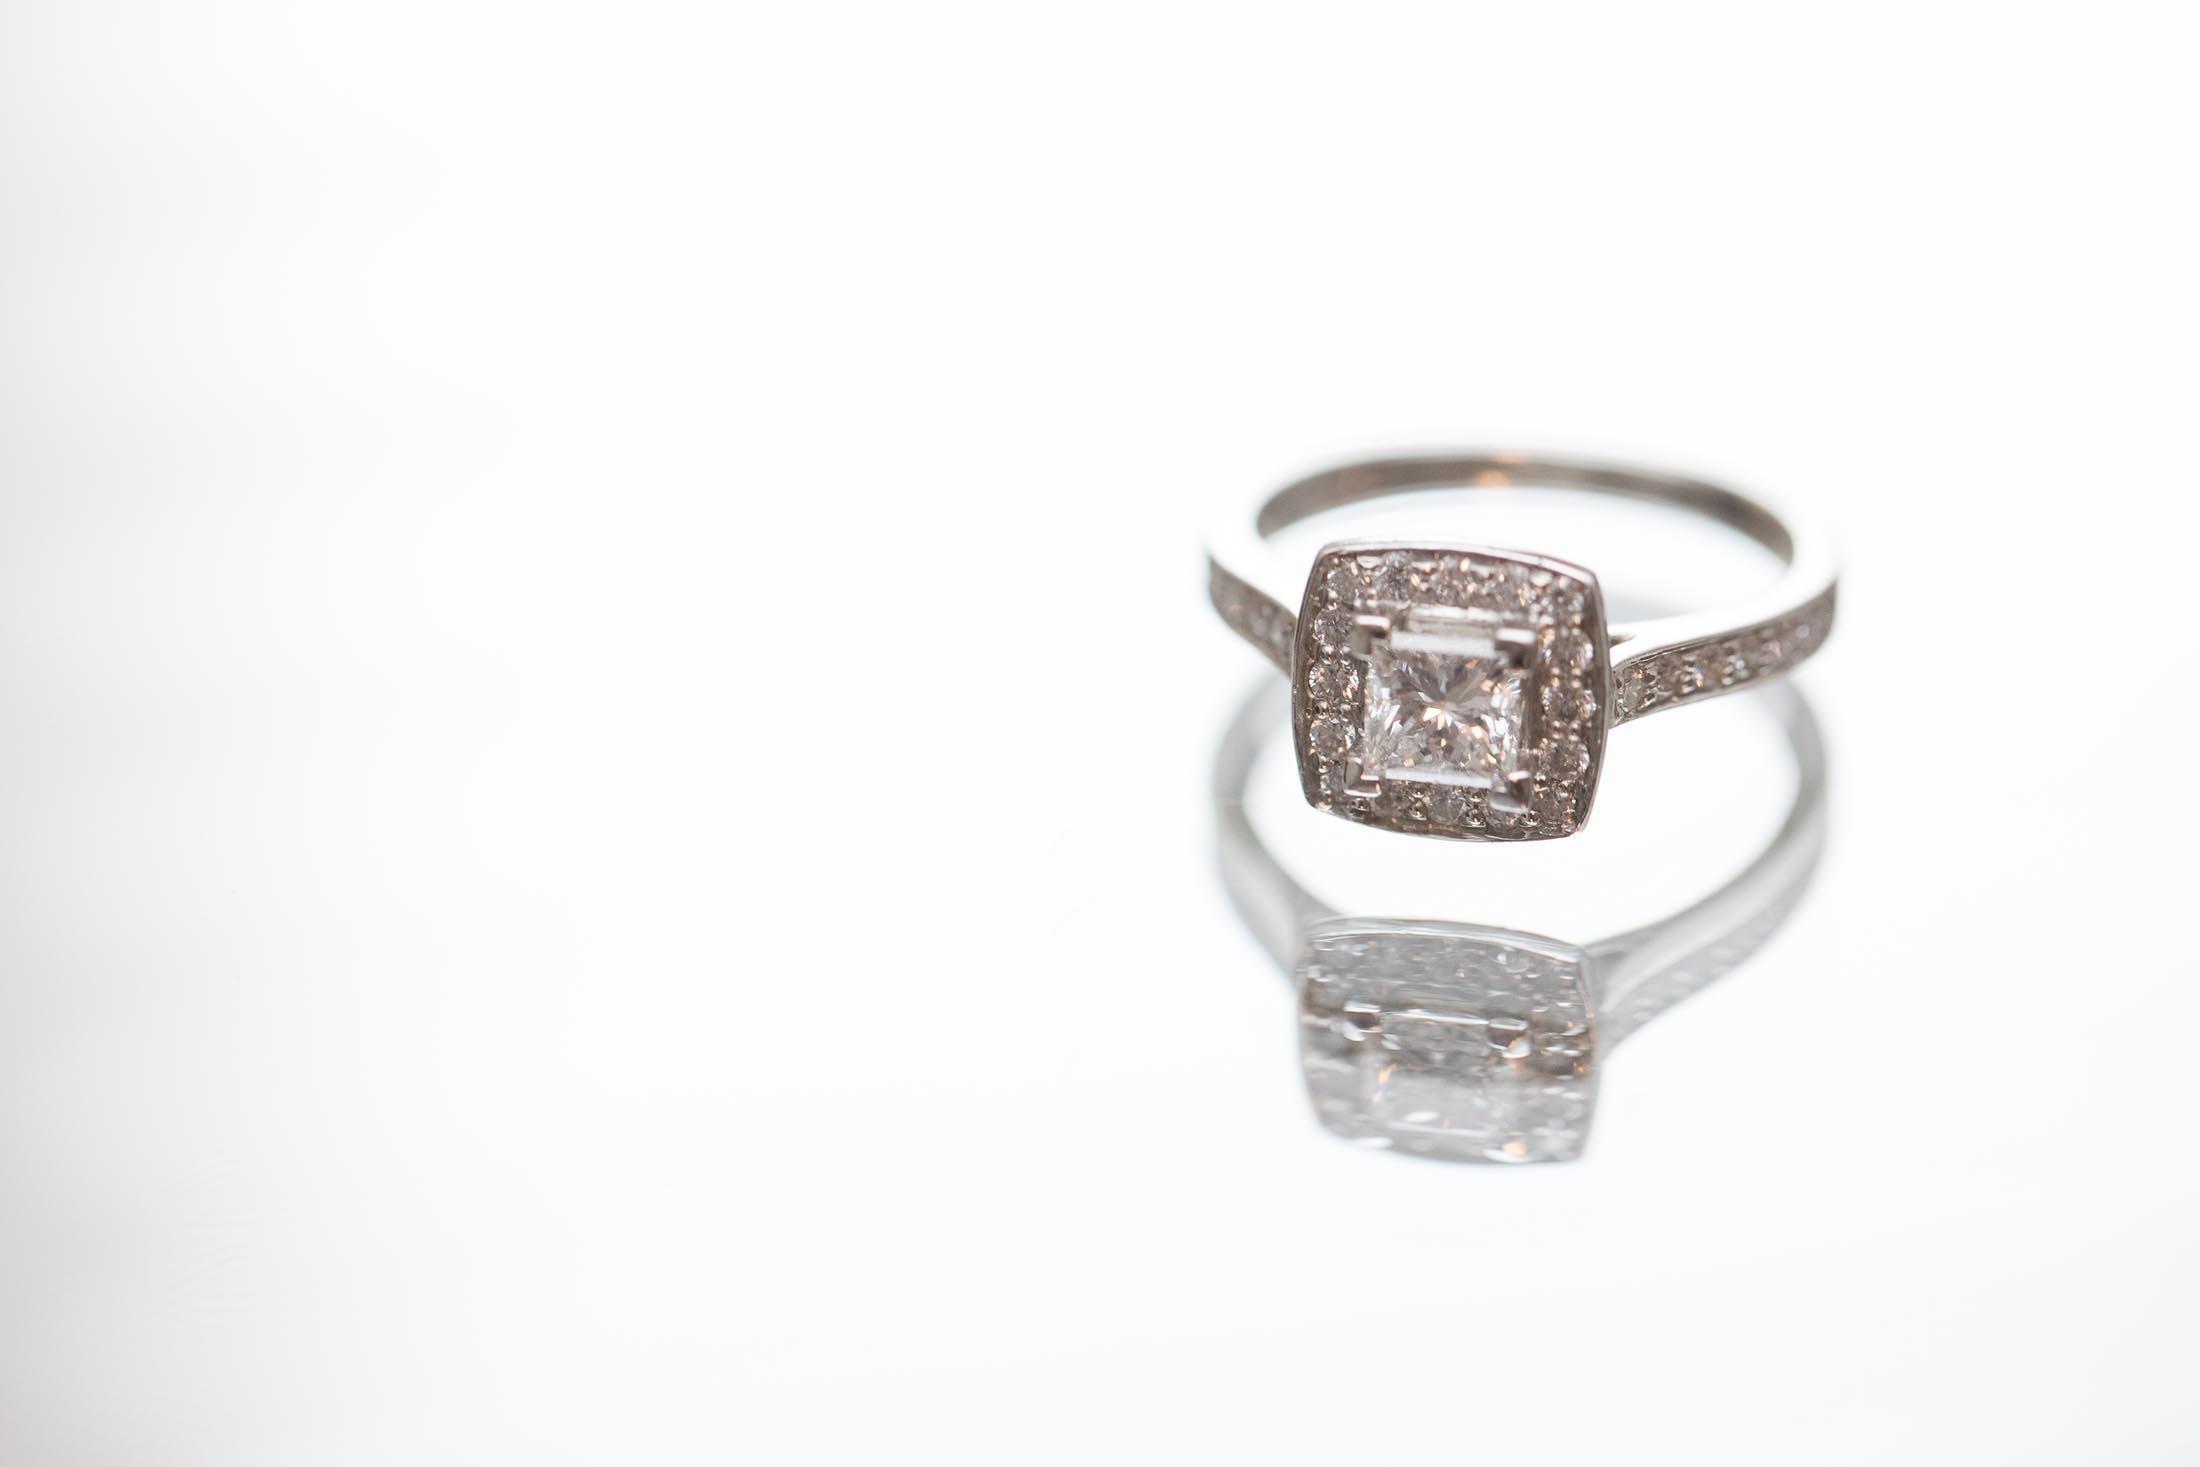 The Wedding Ring at Rudding Park